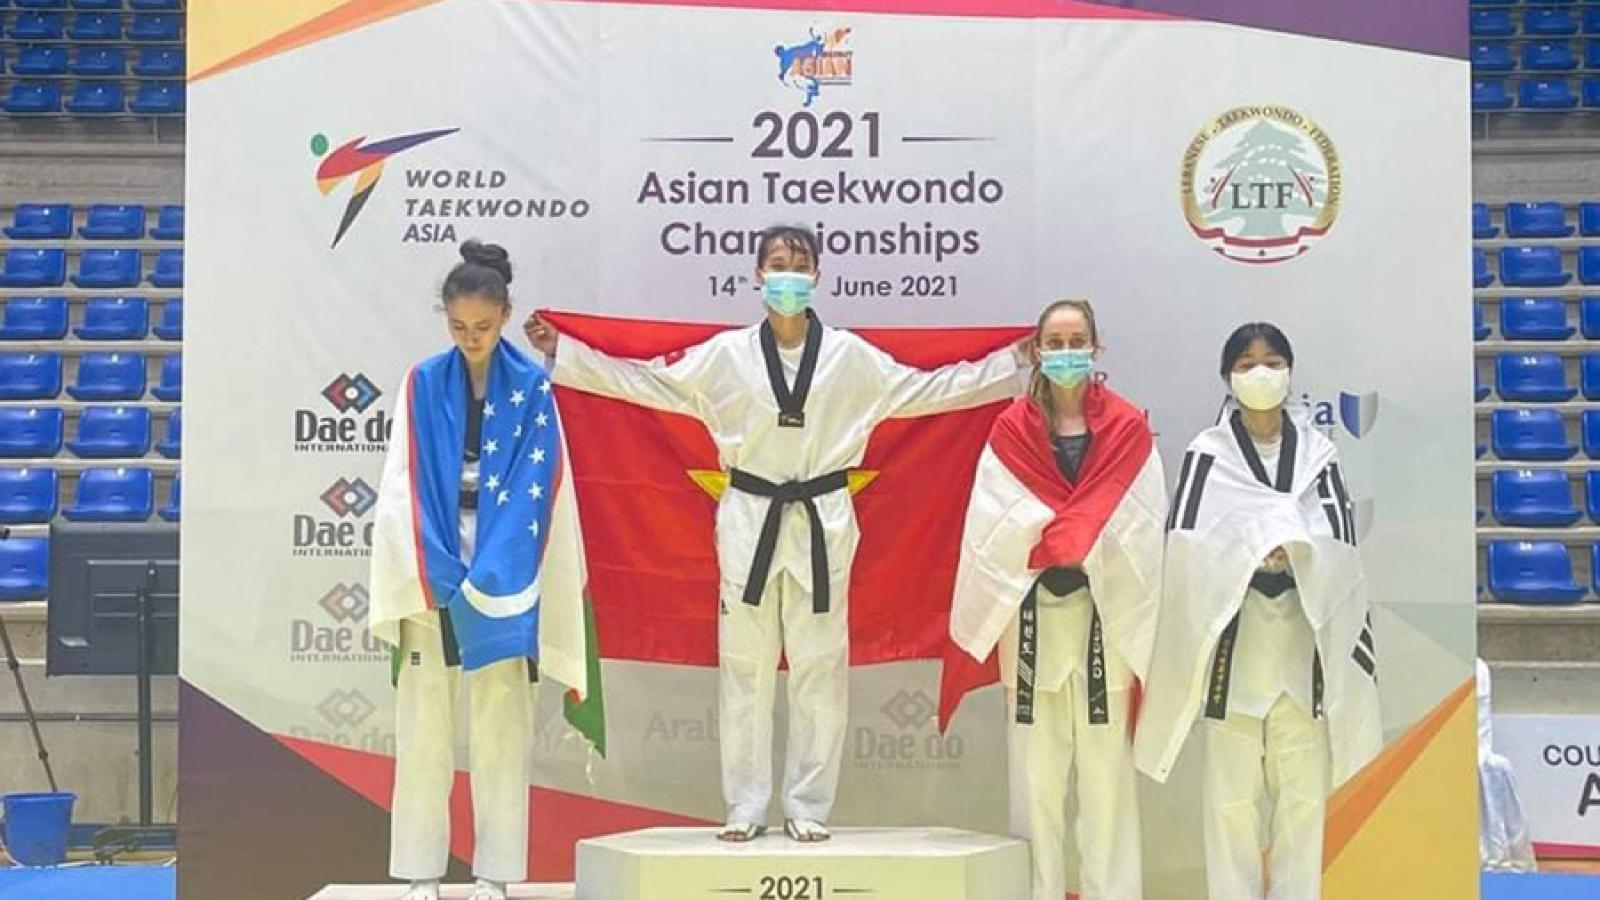 Local martial artist bags gold medal at Asian taekwondo tournament